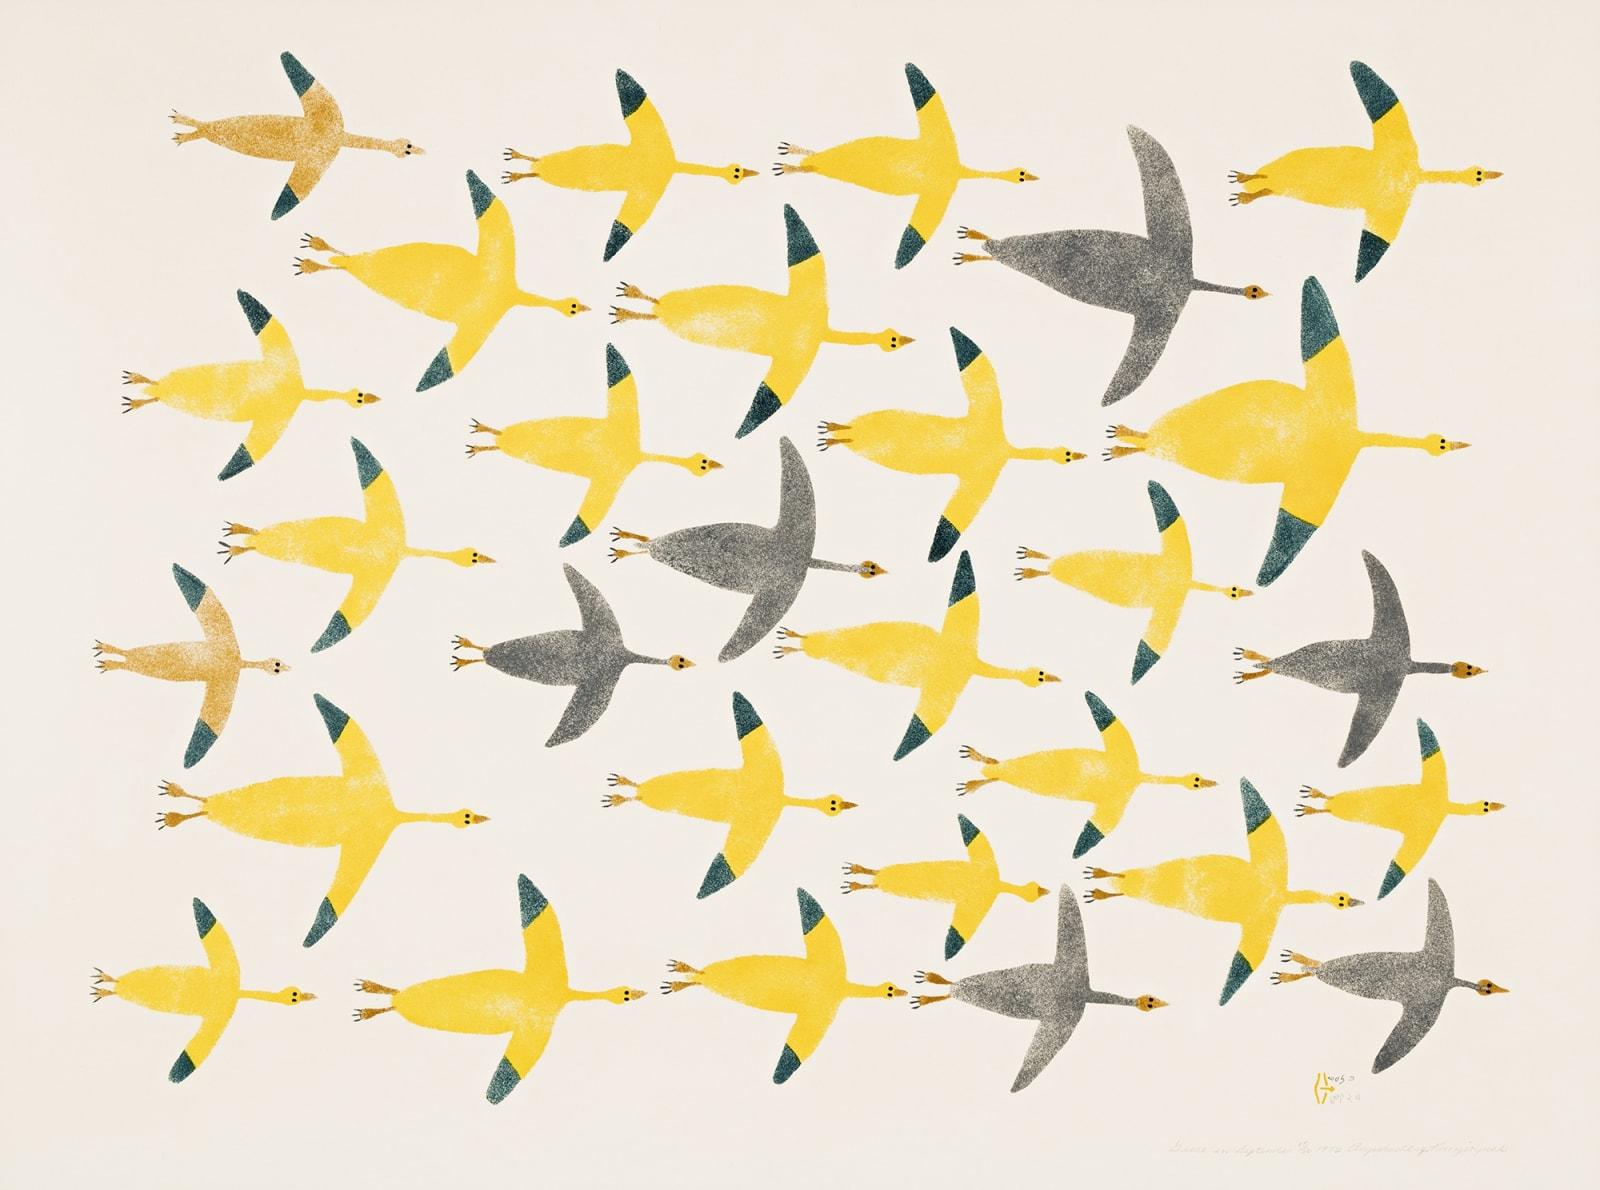 Lot 86 LUKE ANGUHADLUQ (1895-1982) QAMANI'TUAQ (BAKER LAKE) Geese in September, 1972 (1973 #3) stencil, framed, sight: 28.5 x 42.5 in (72.4 x 108 cm) Estimate: $2,500— $3,500 Price realized: $4,800